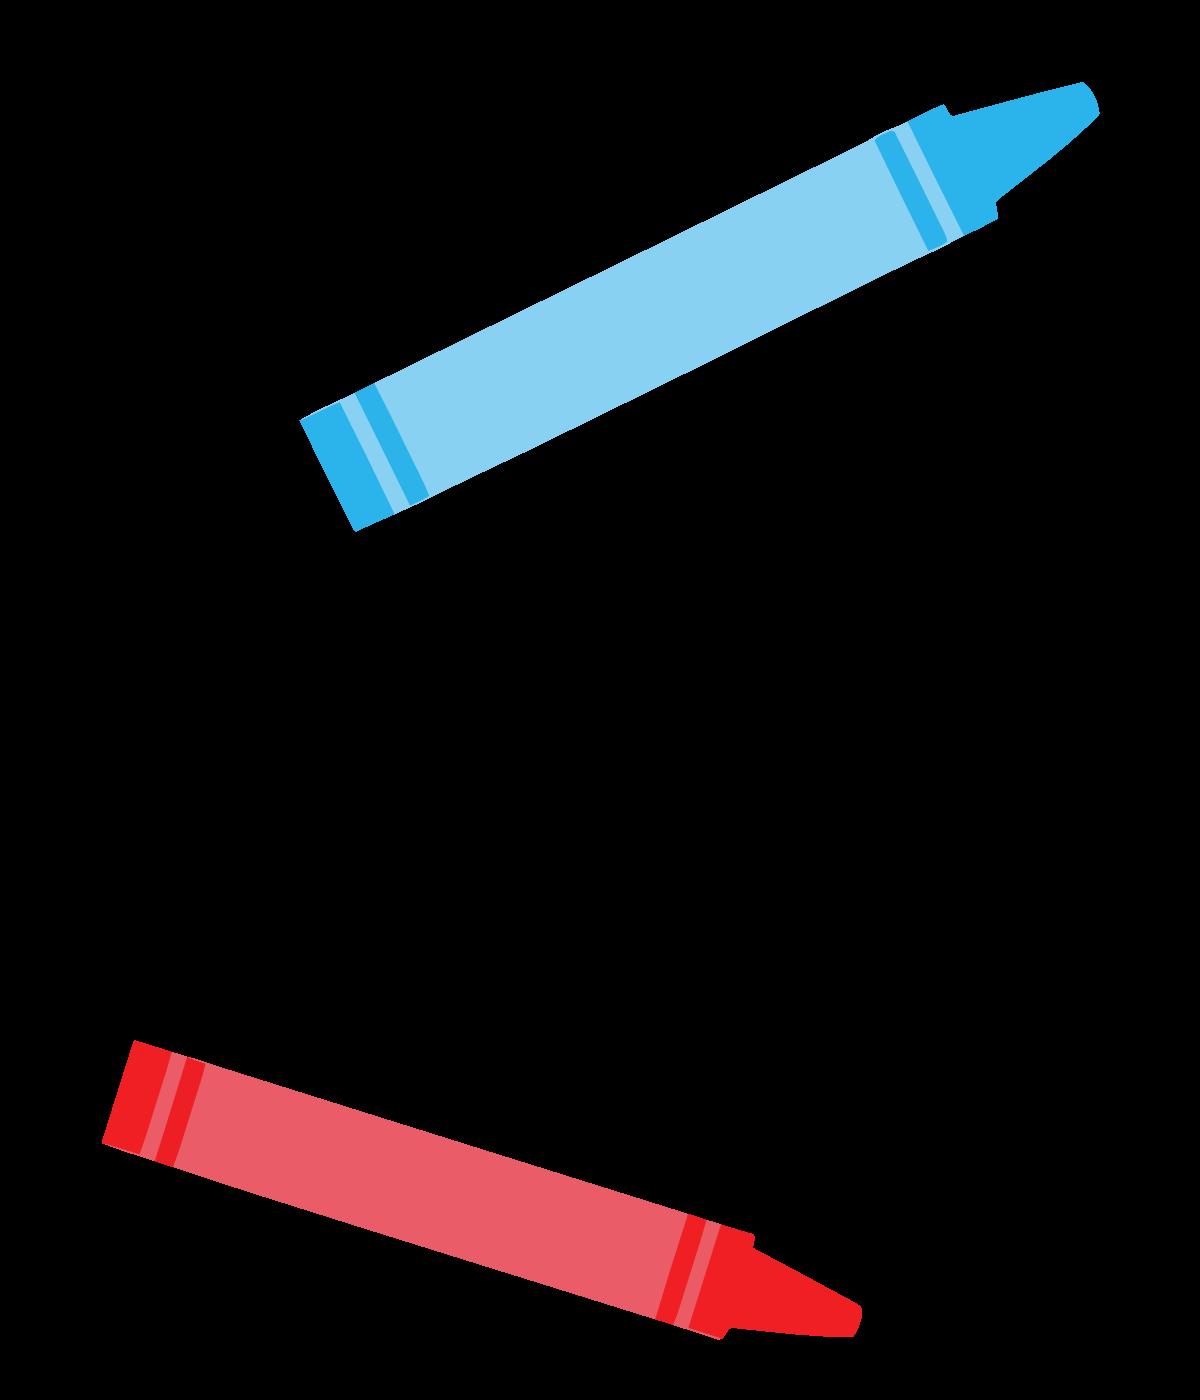 crayons 3